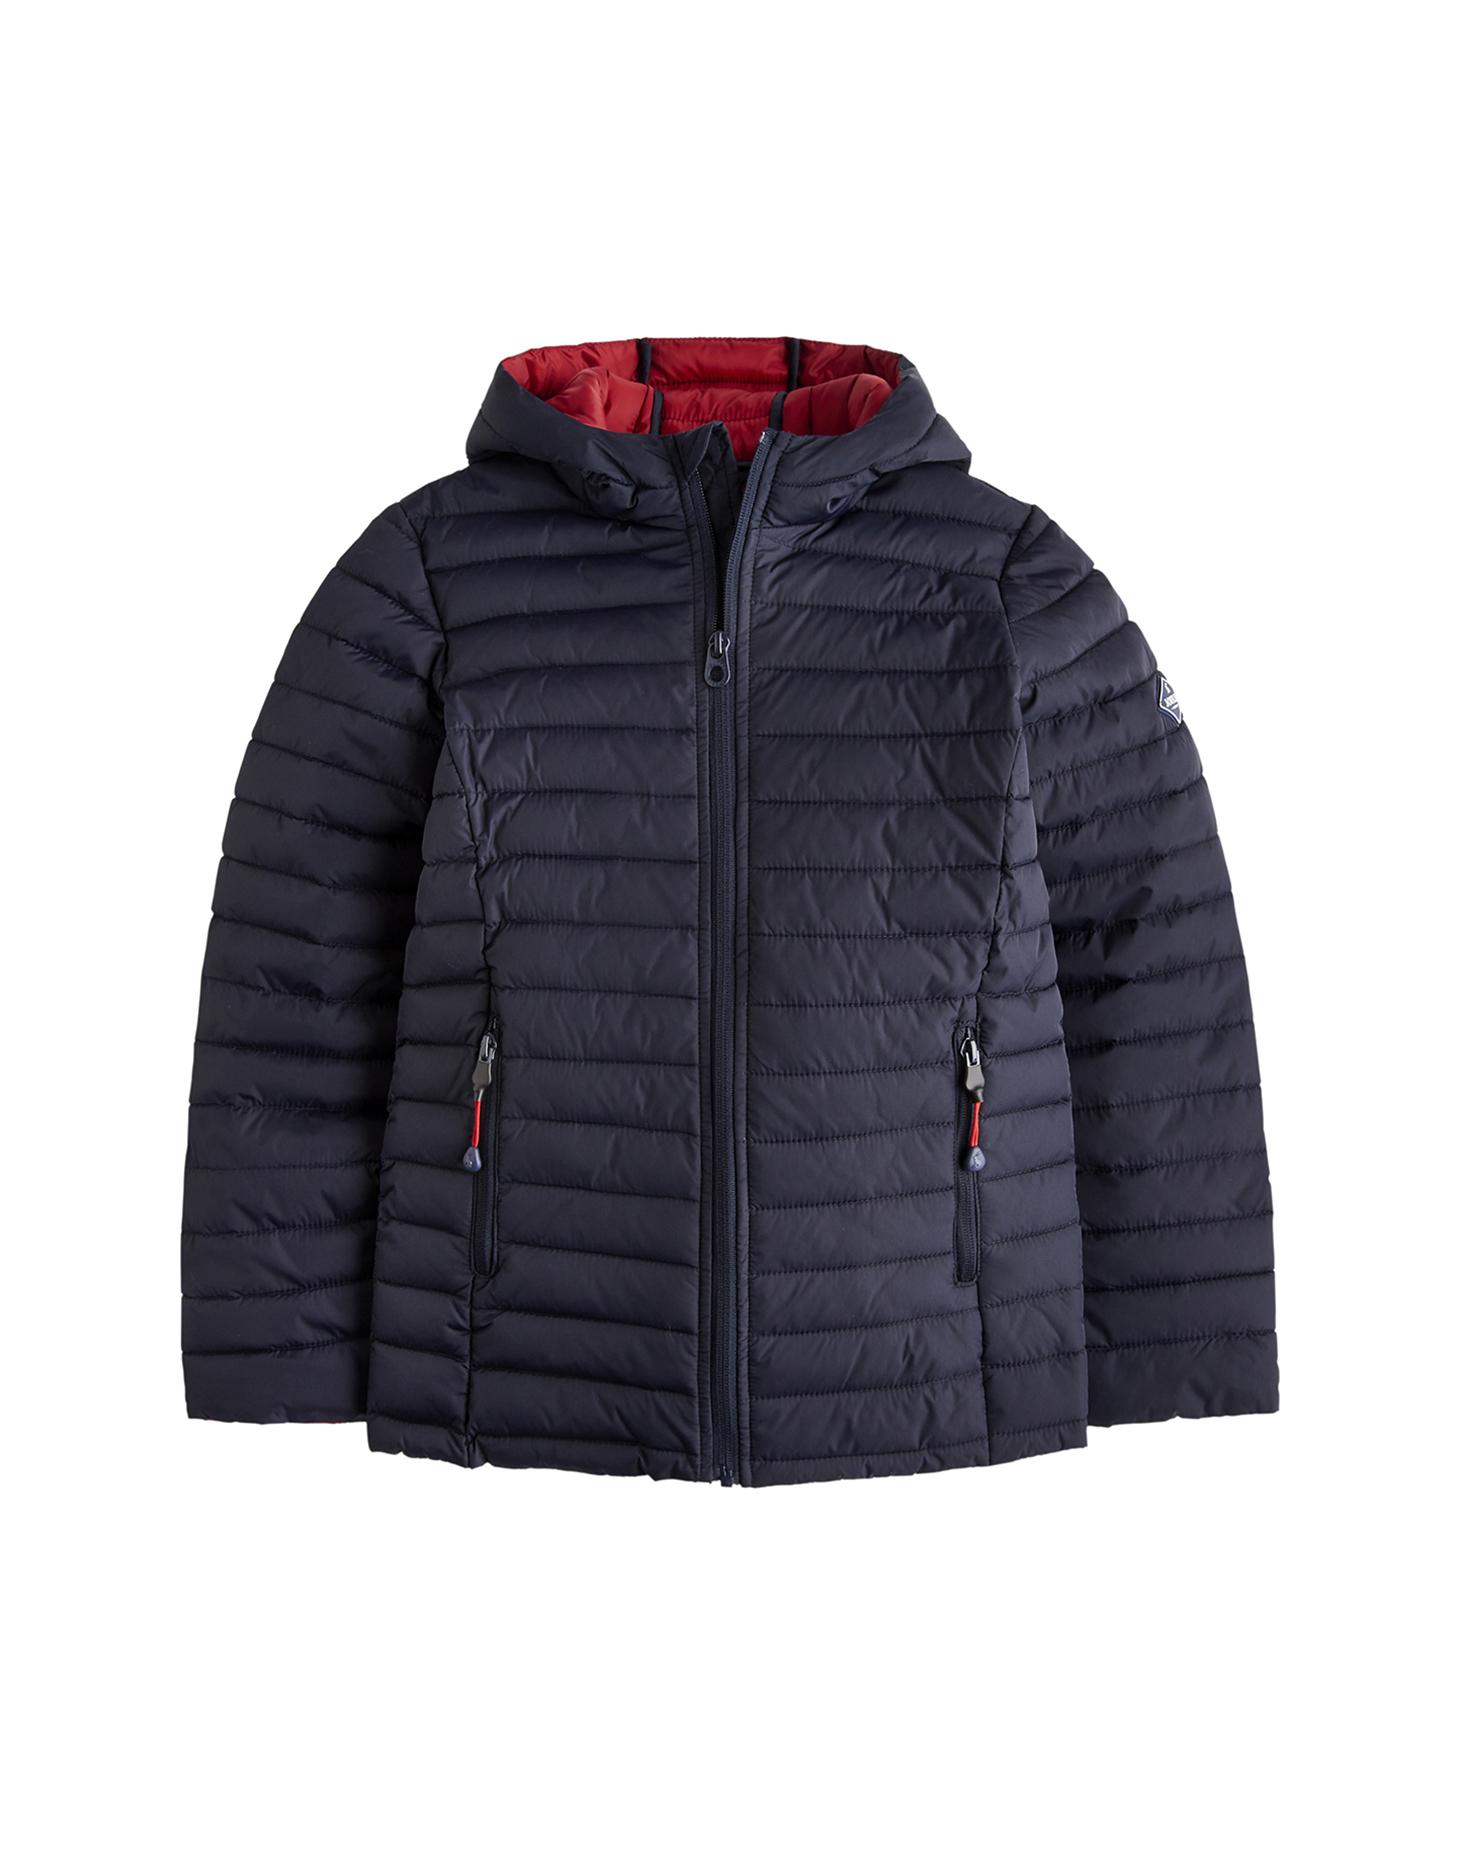 Joules Cairn Abrigo Packaway para Ni/ños